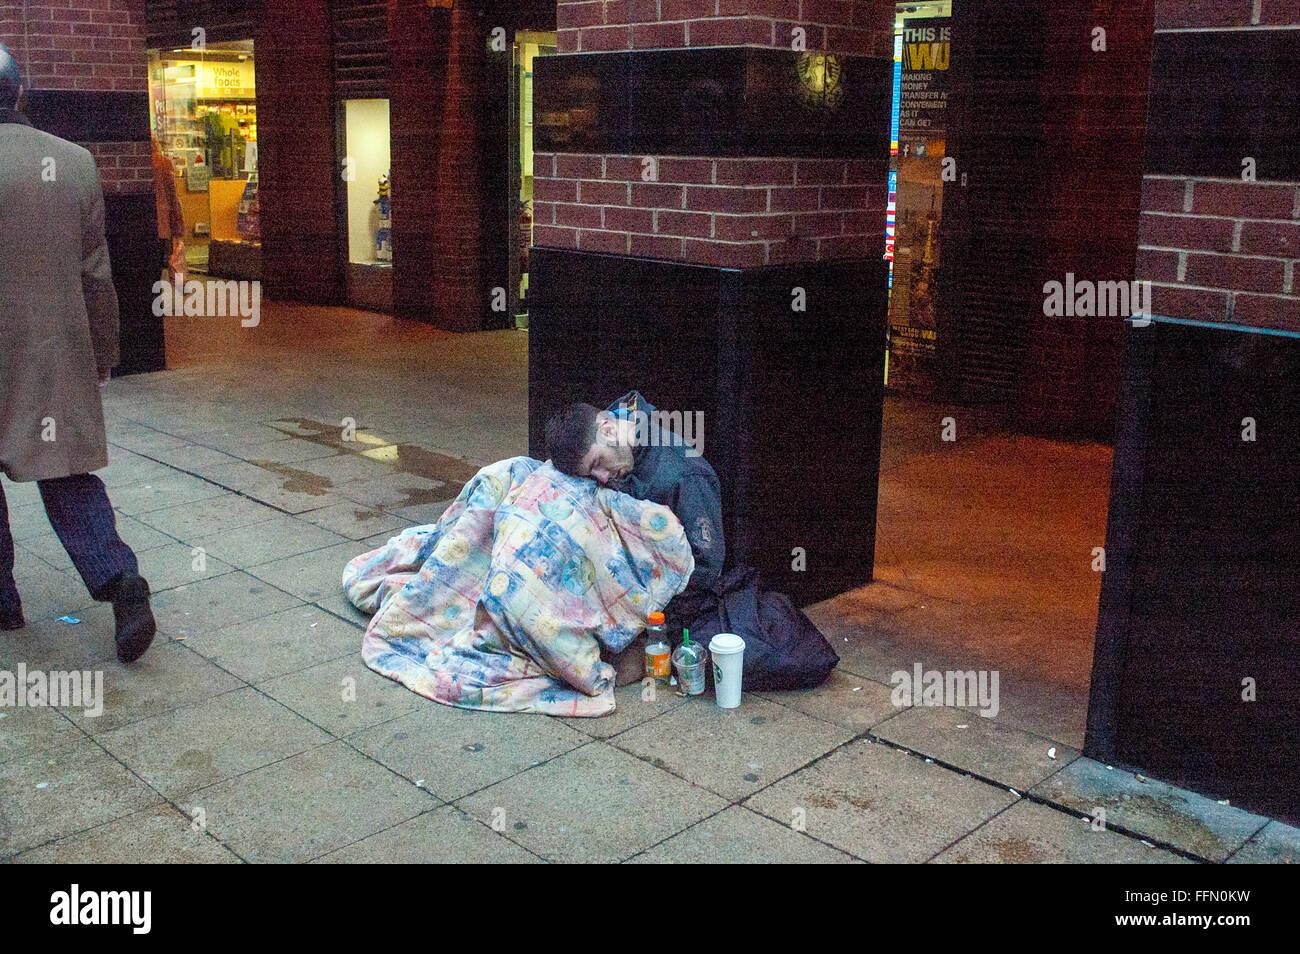 London,UK,16 February 2016,Street sleepers West End London.People sleeping homeless streets London is on increase. - Stock Image